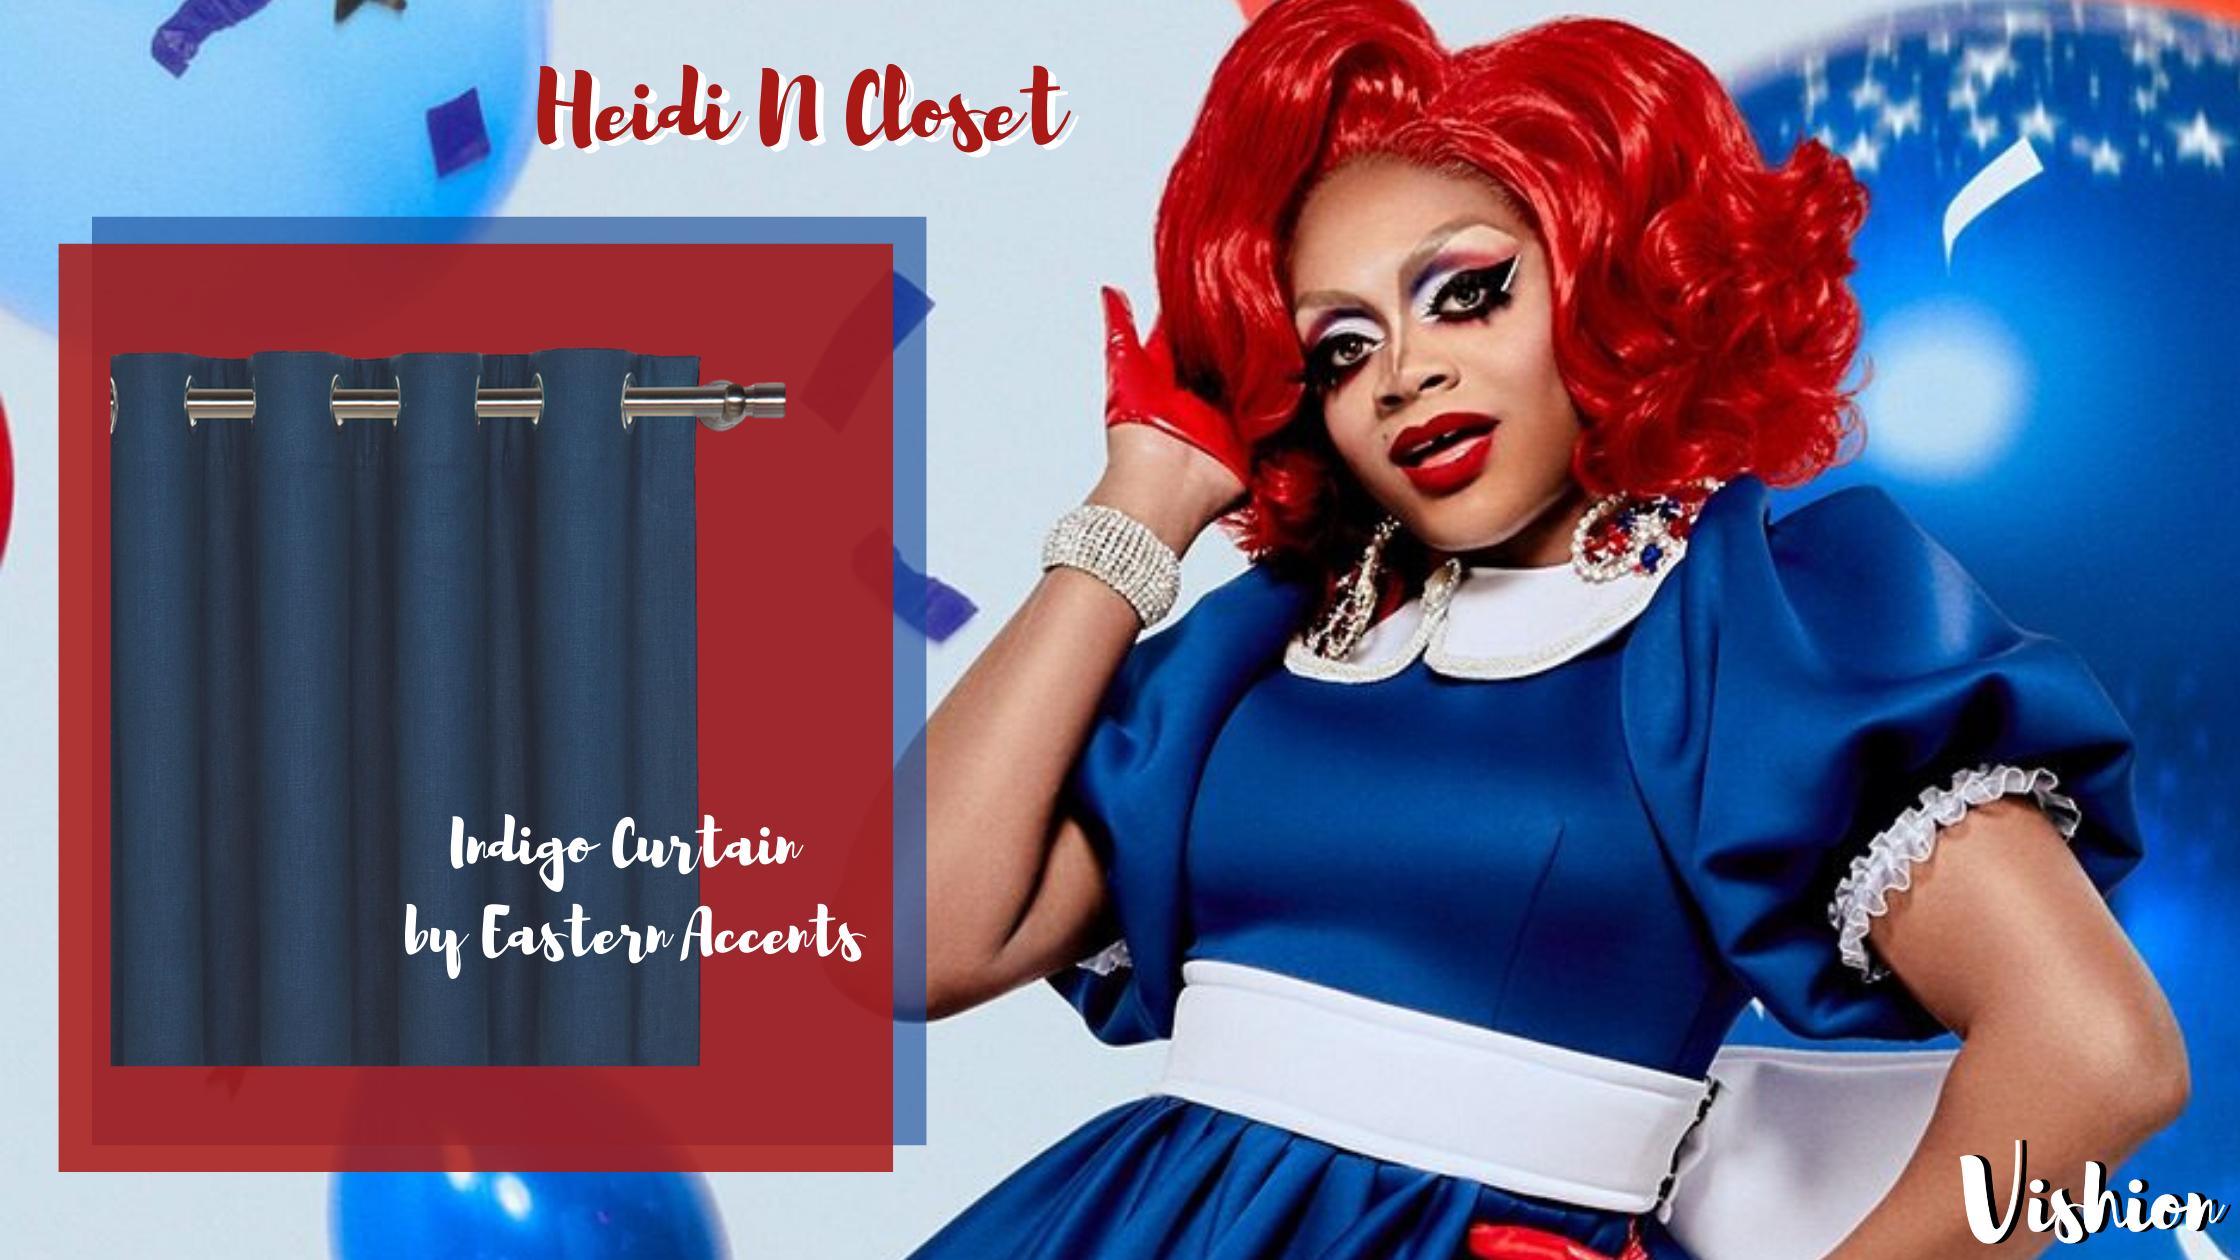 Drag Queen Heidi N Closet and Indigo blue Curtains by Eastern Accents